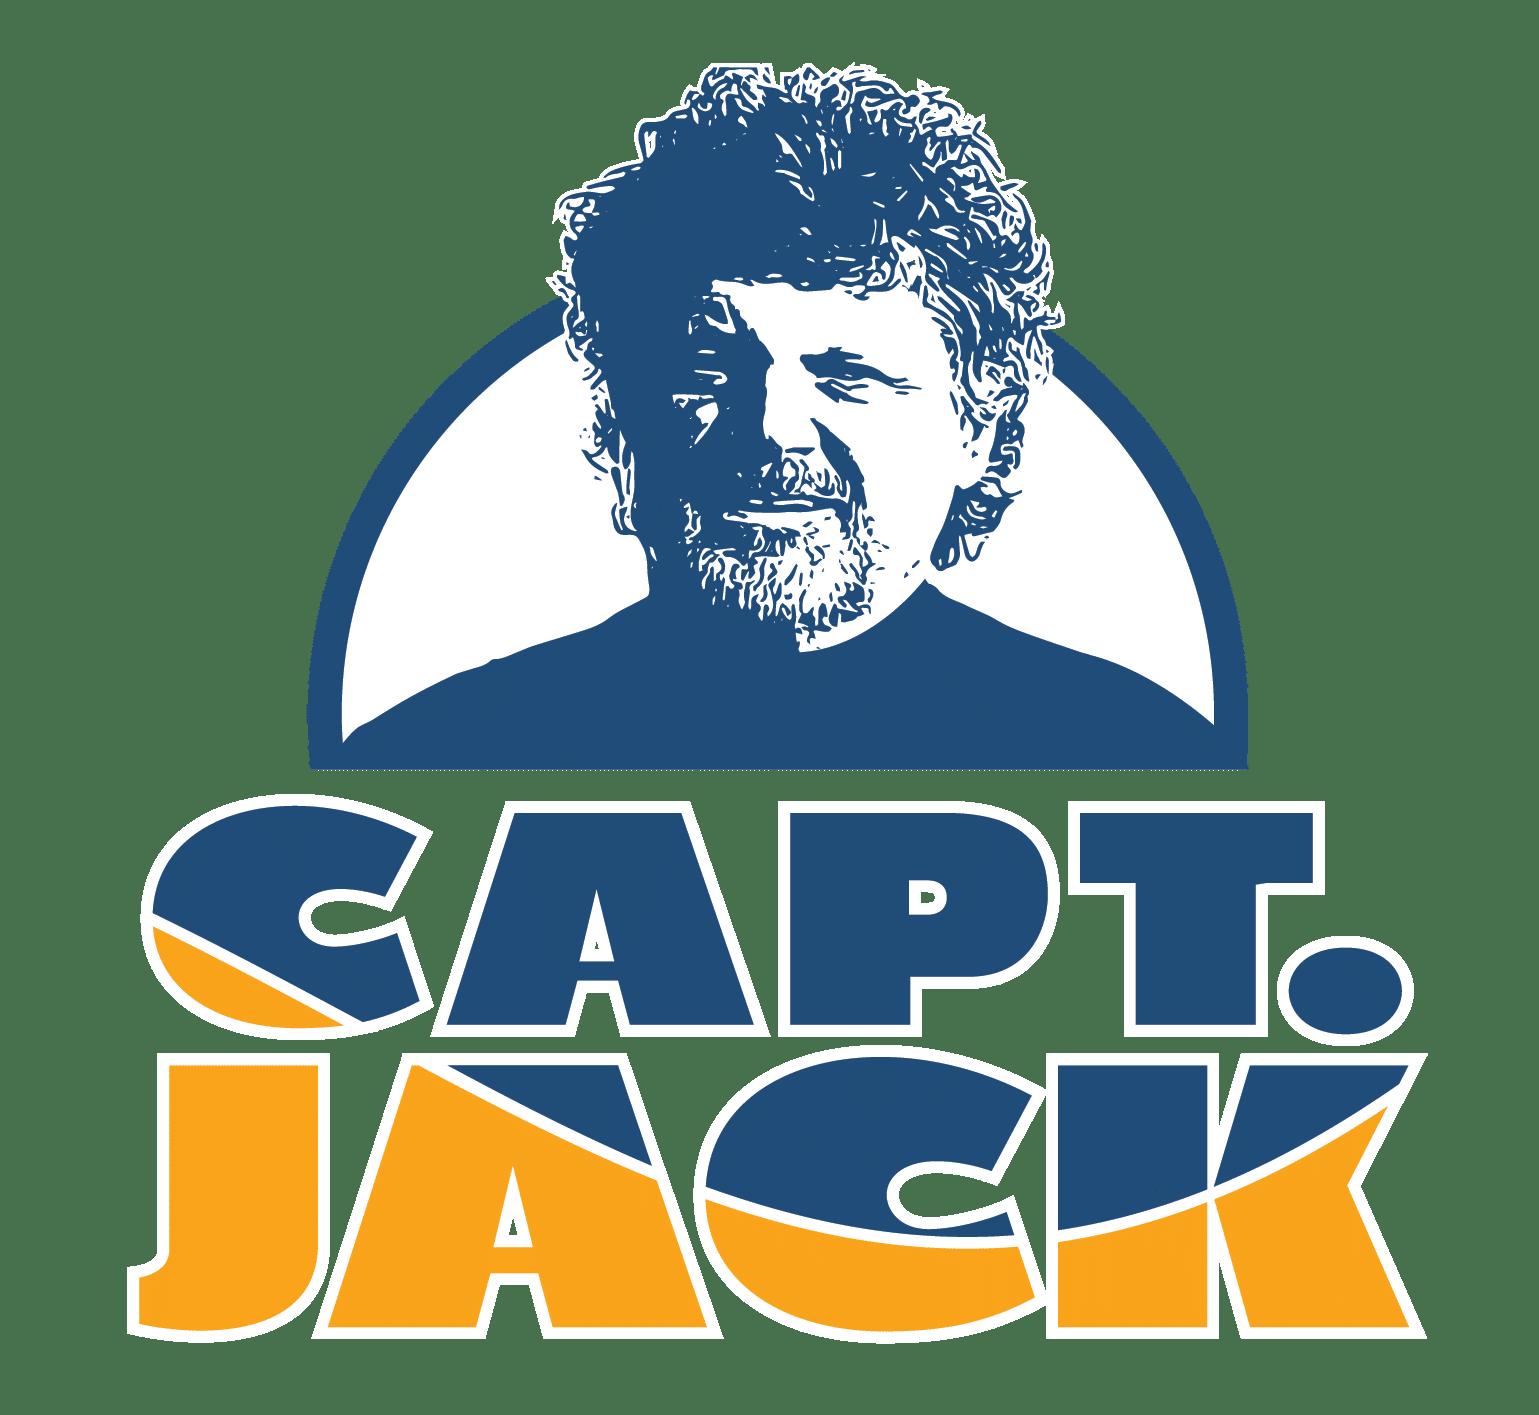 Capt Jack Photography